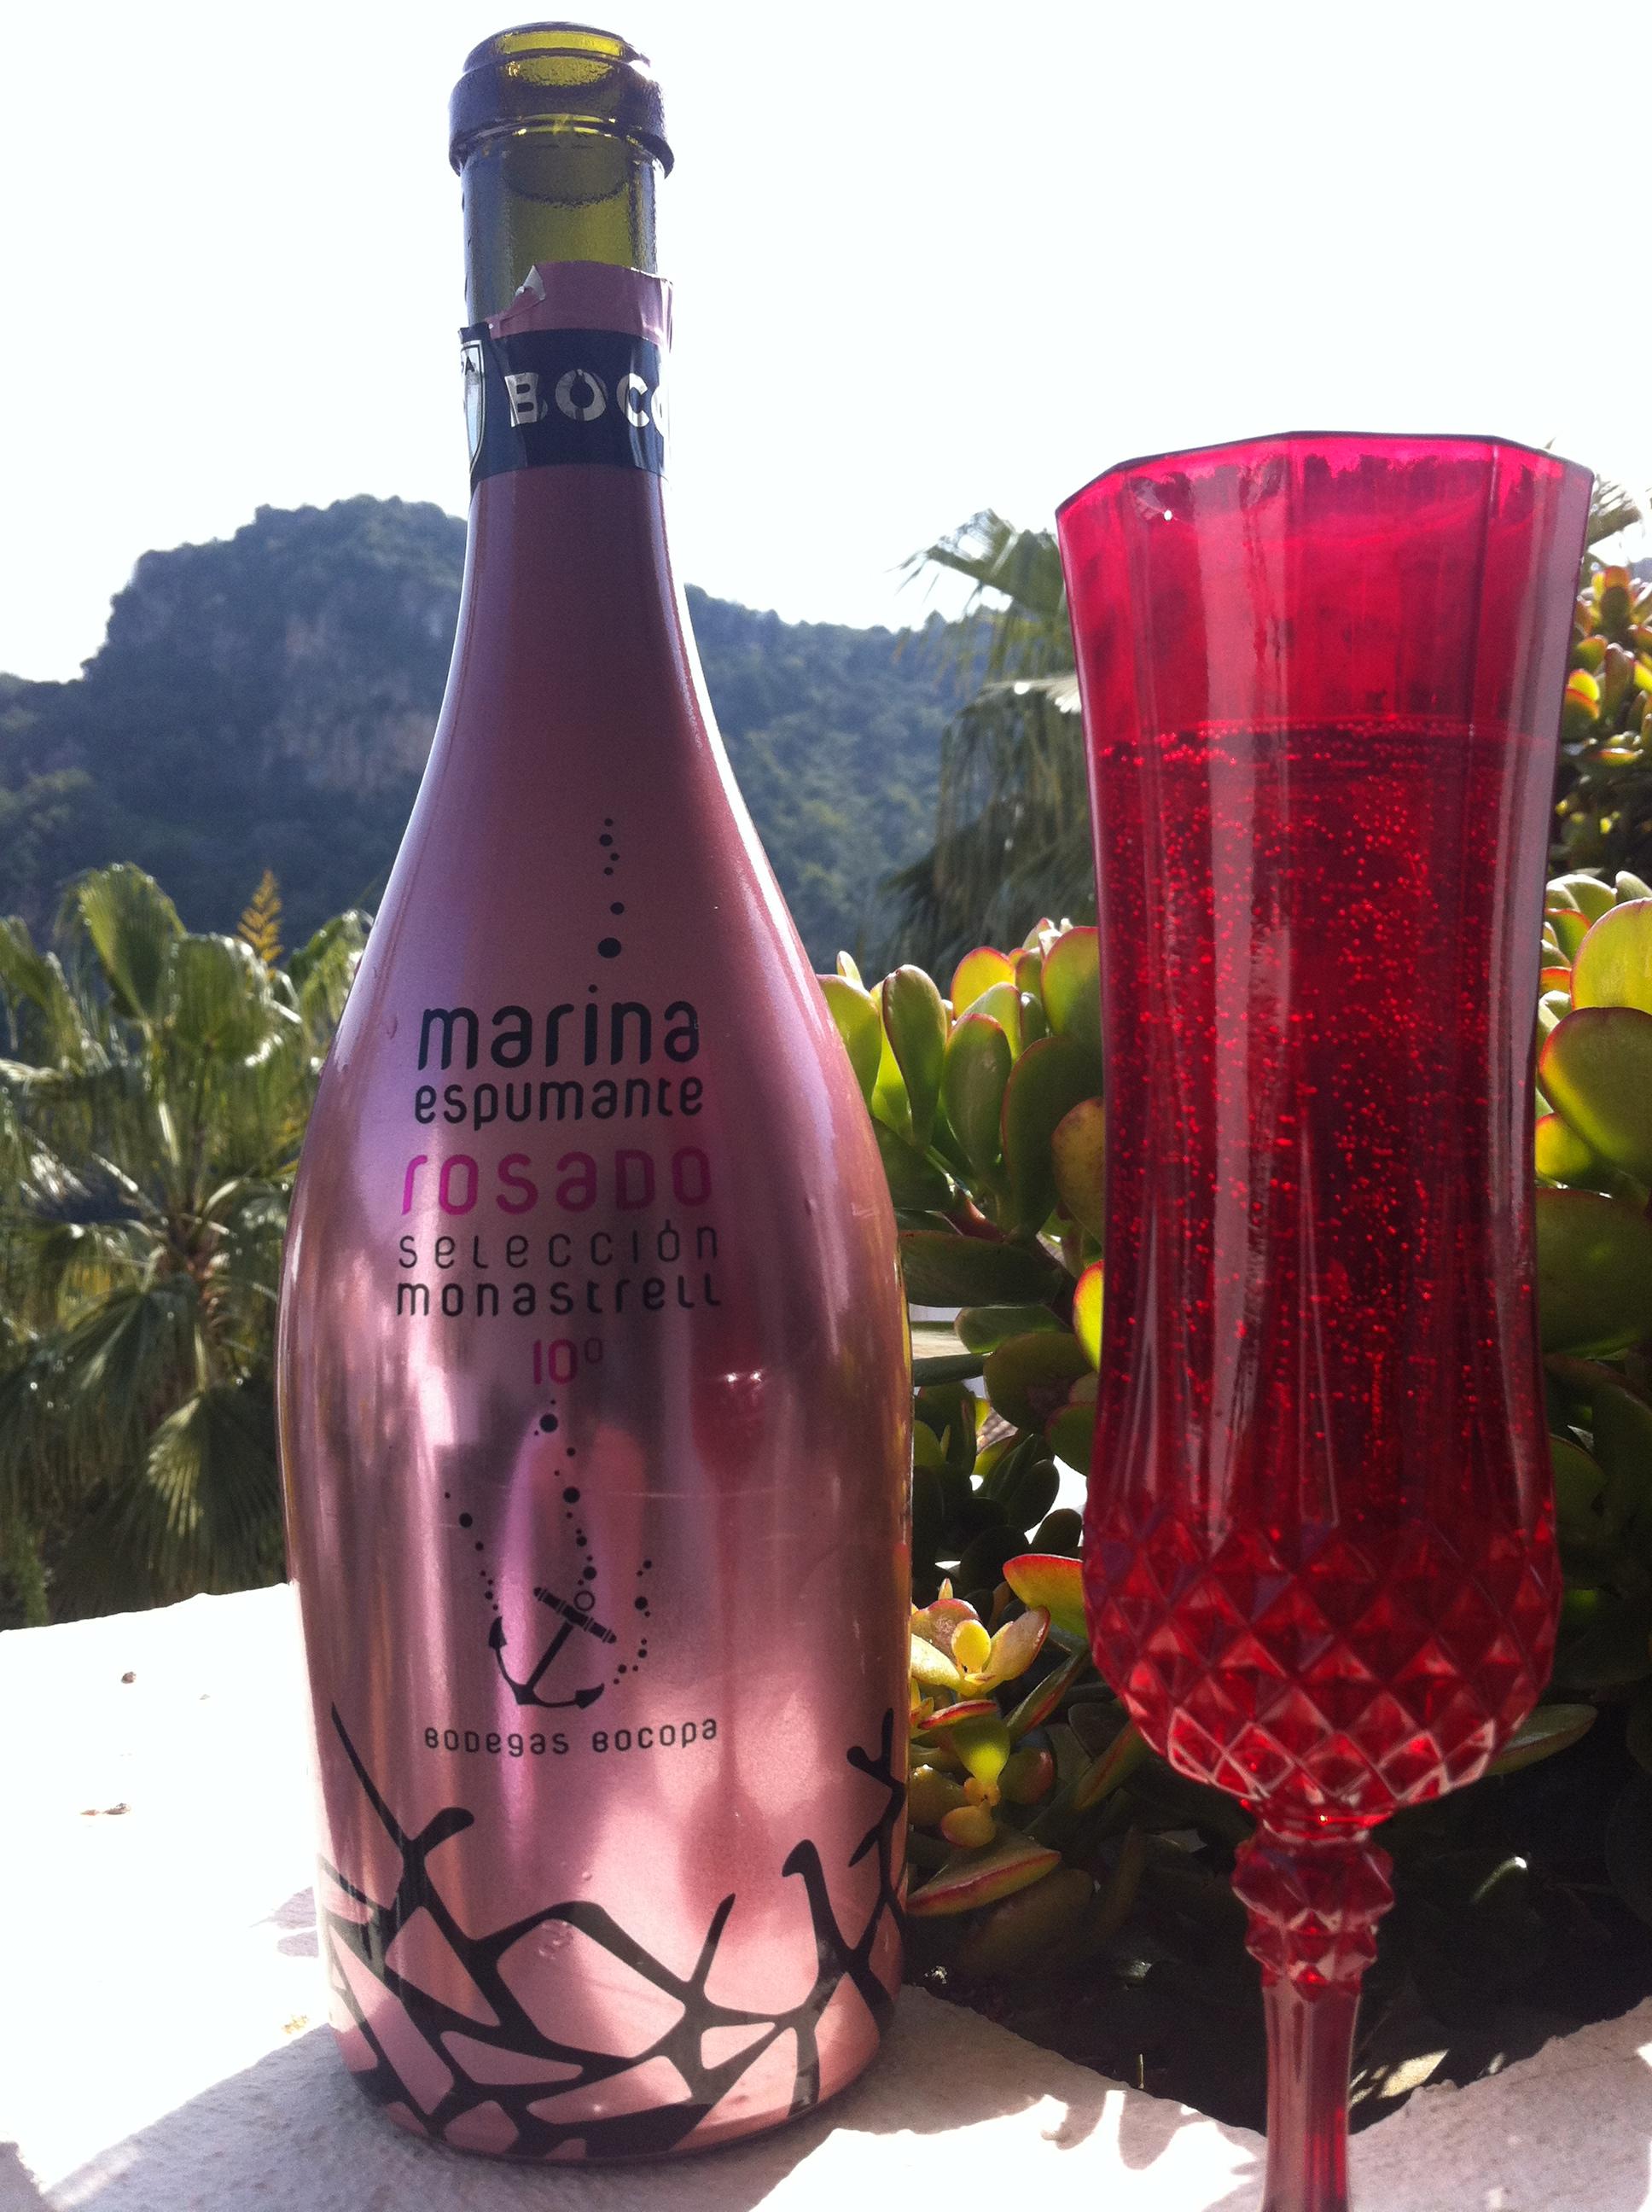 Marina espumante rosado' from the Bocopa Winery.